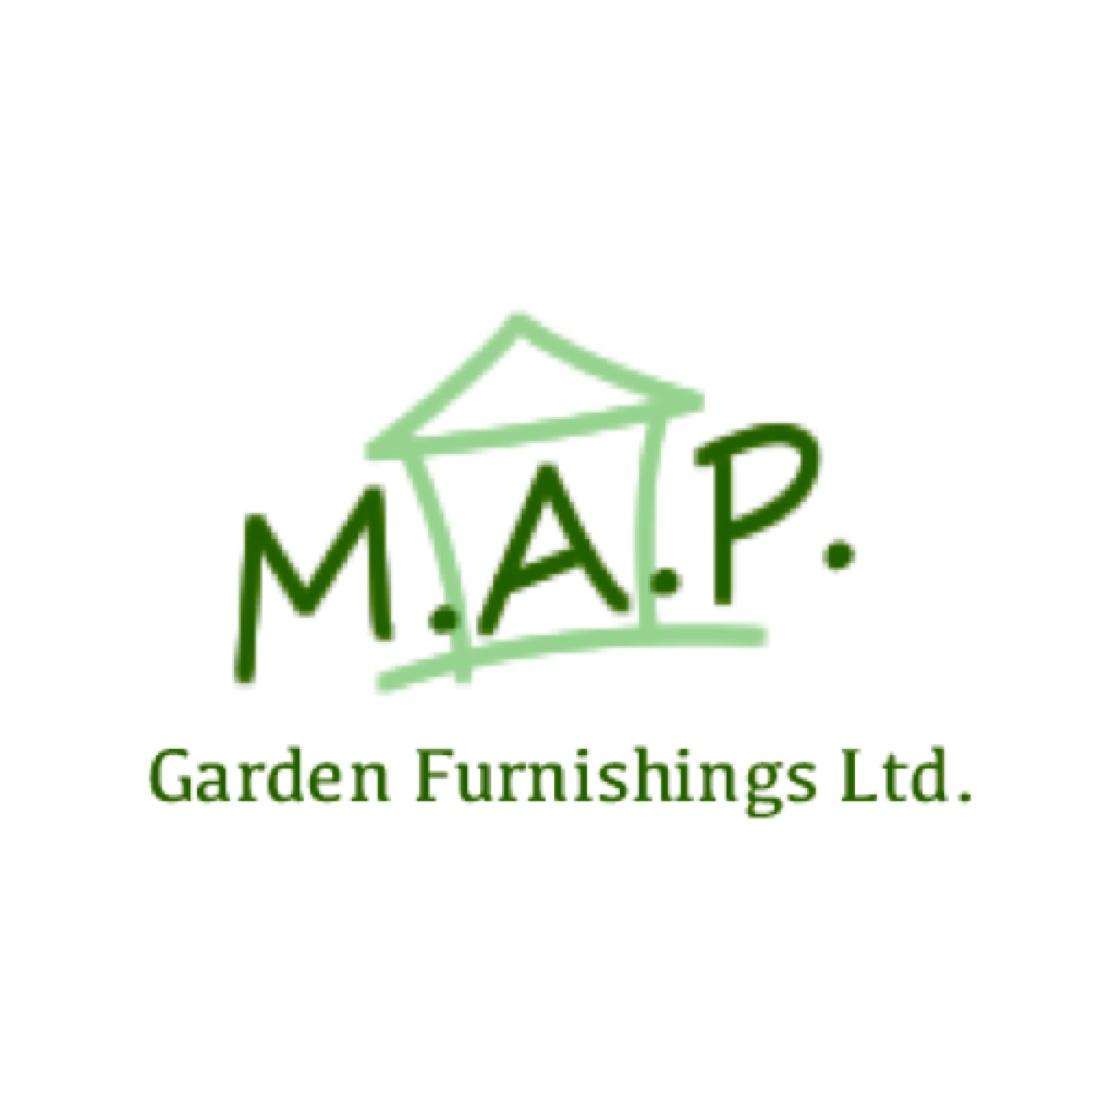 Barclay Summerhouse - 2.1 x 2.1m (7 x 7ft)